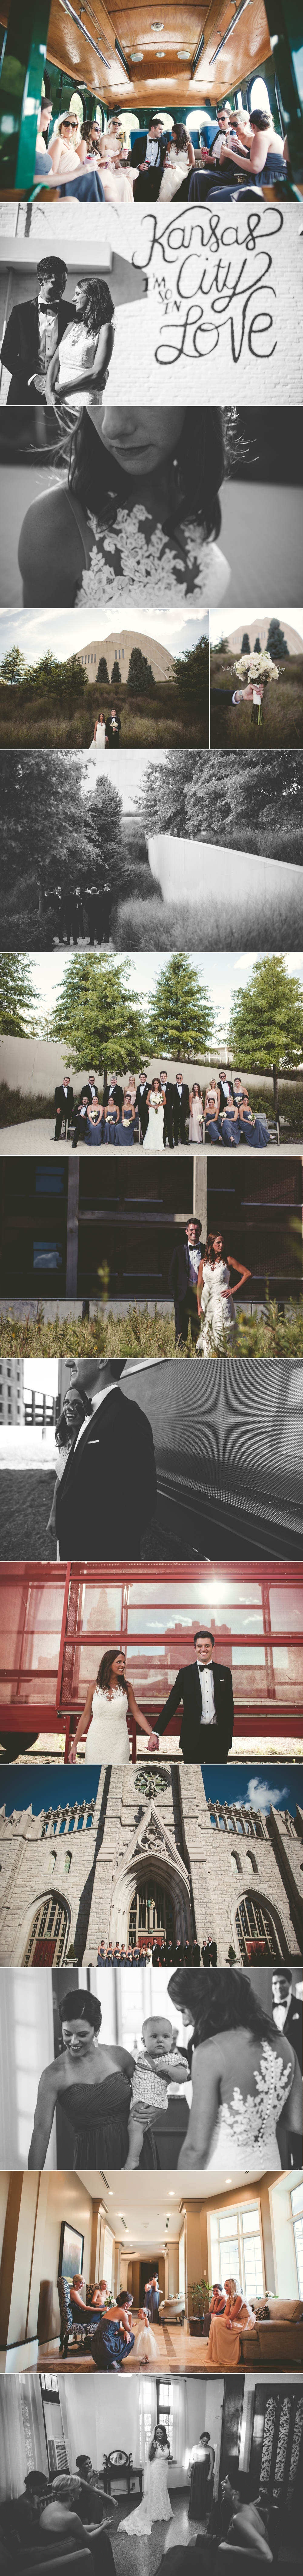 jason_domingues_photography_kansas_city_wedding_redemptorist_hallbrook_02